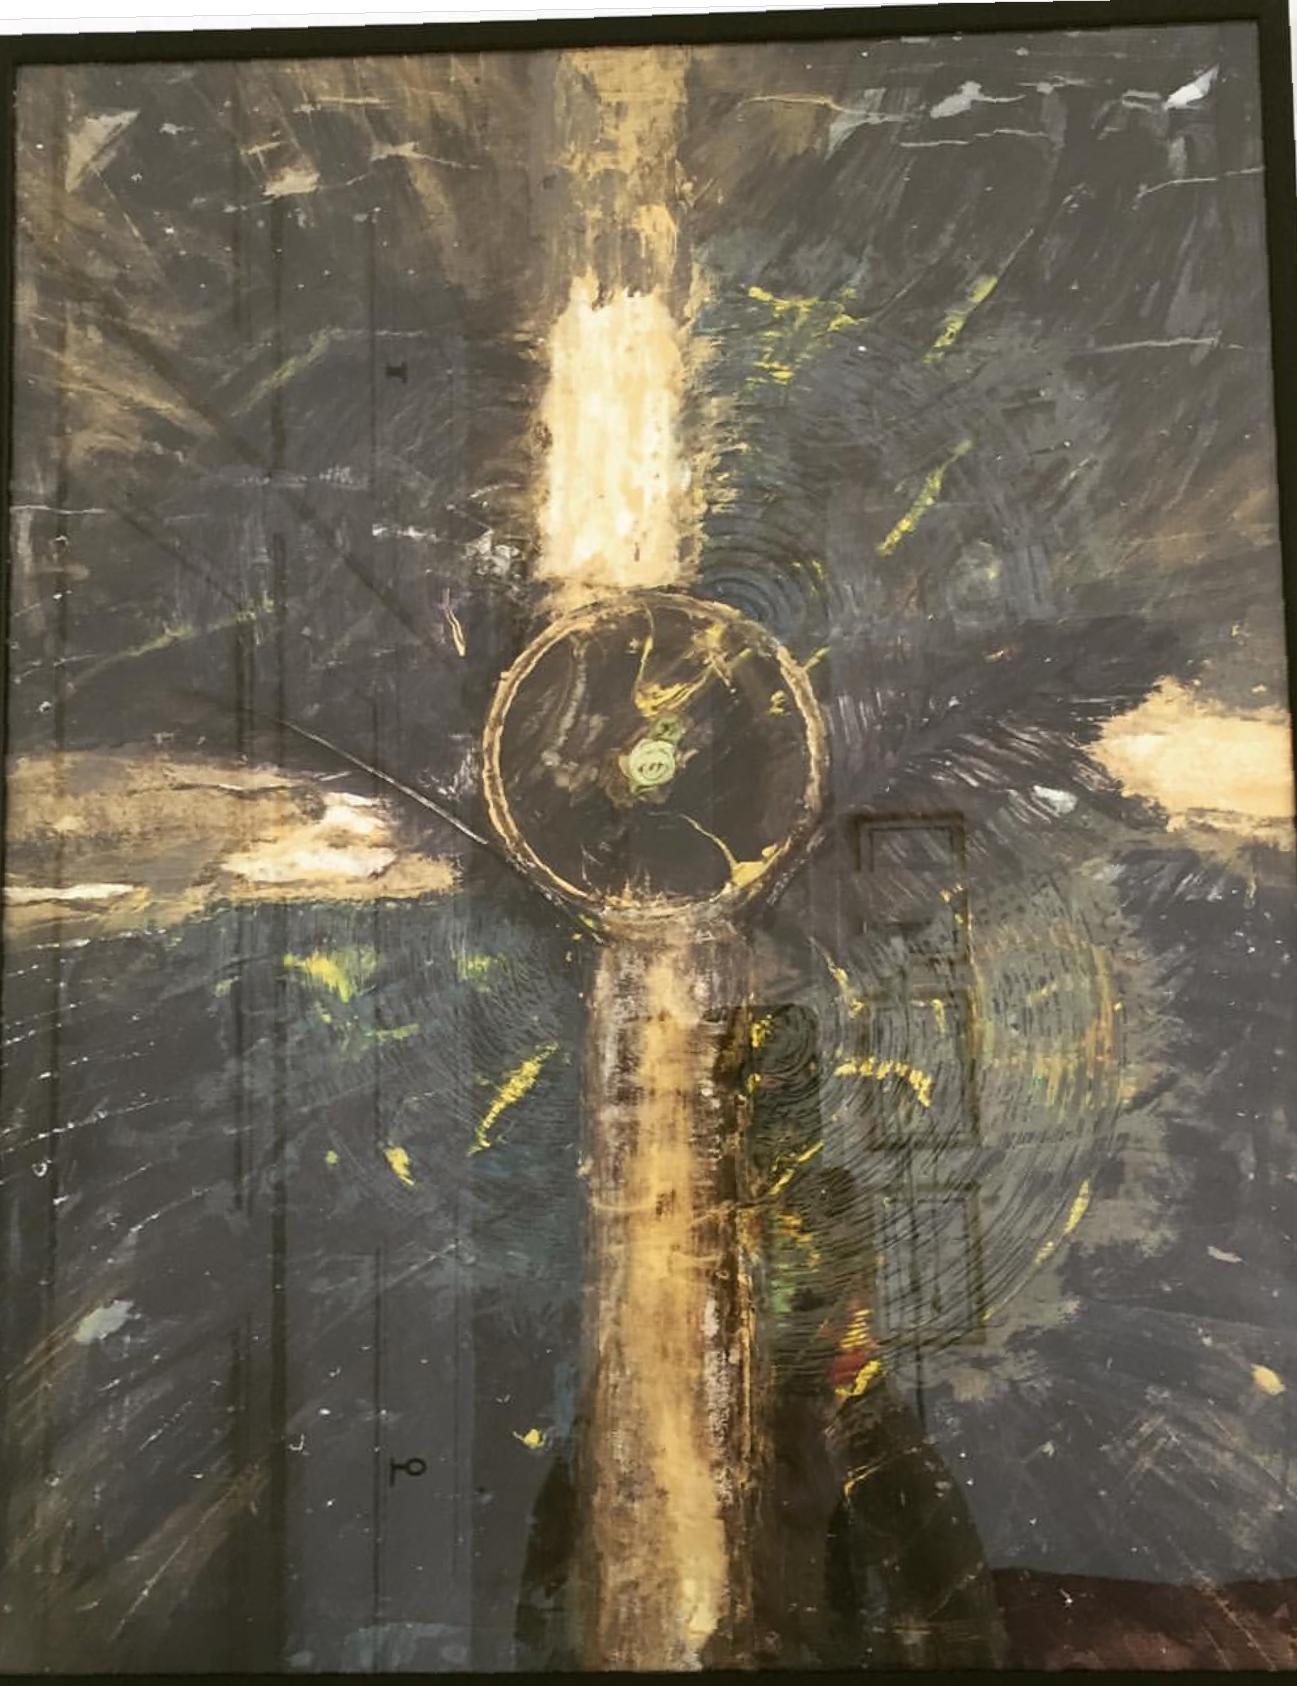 Kreuz 1, Bild 51x41cm Fr. 360.--,  Fr. 390.-- m/Rahmen